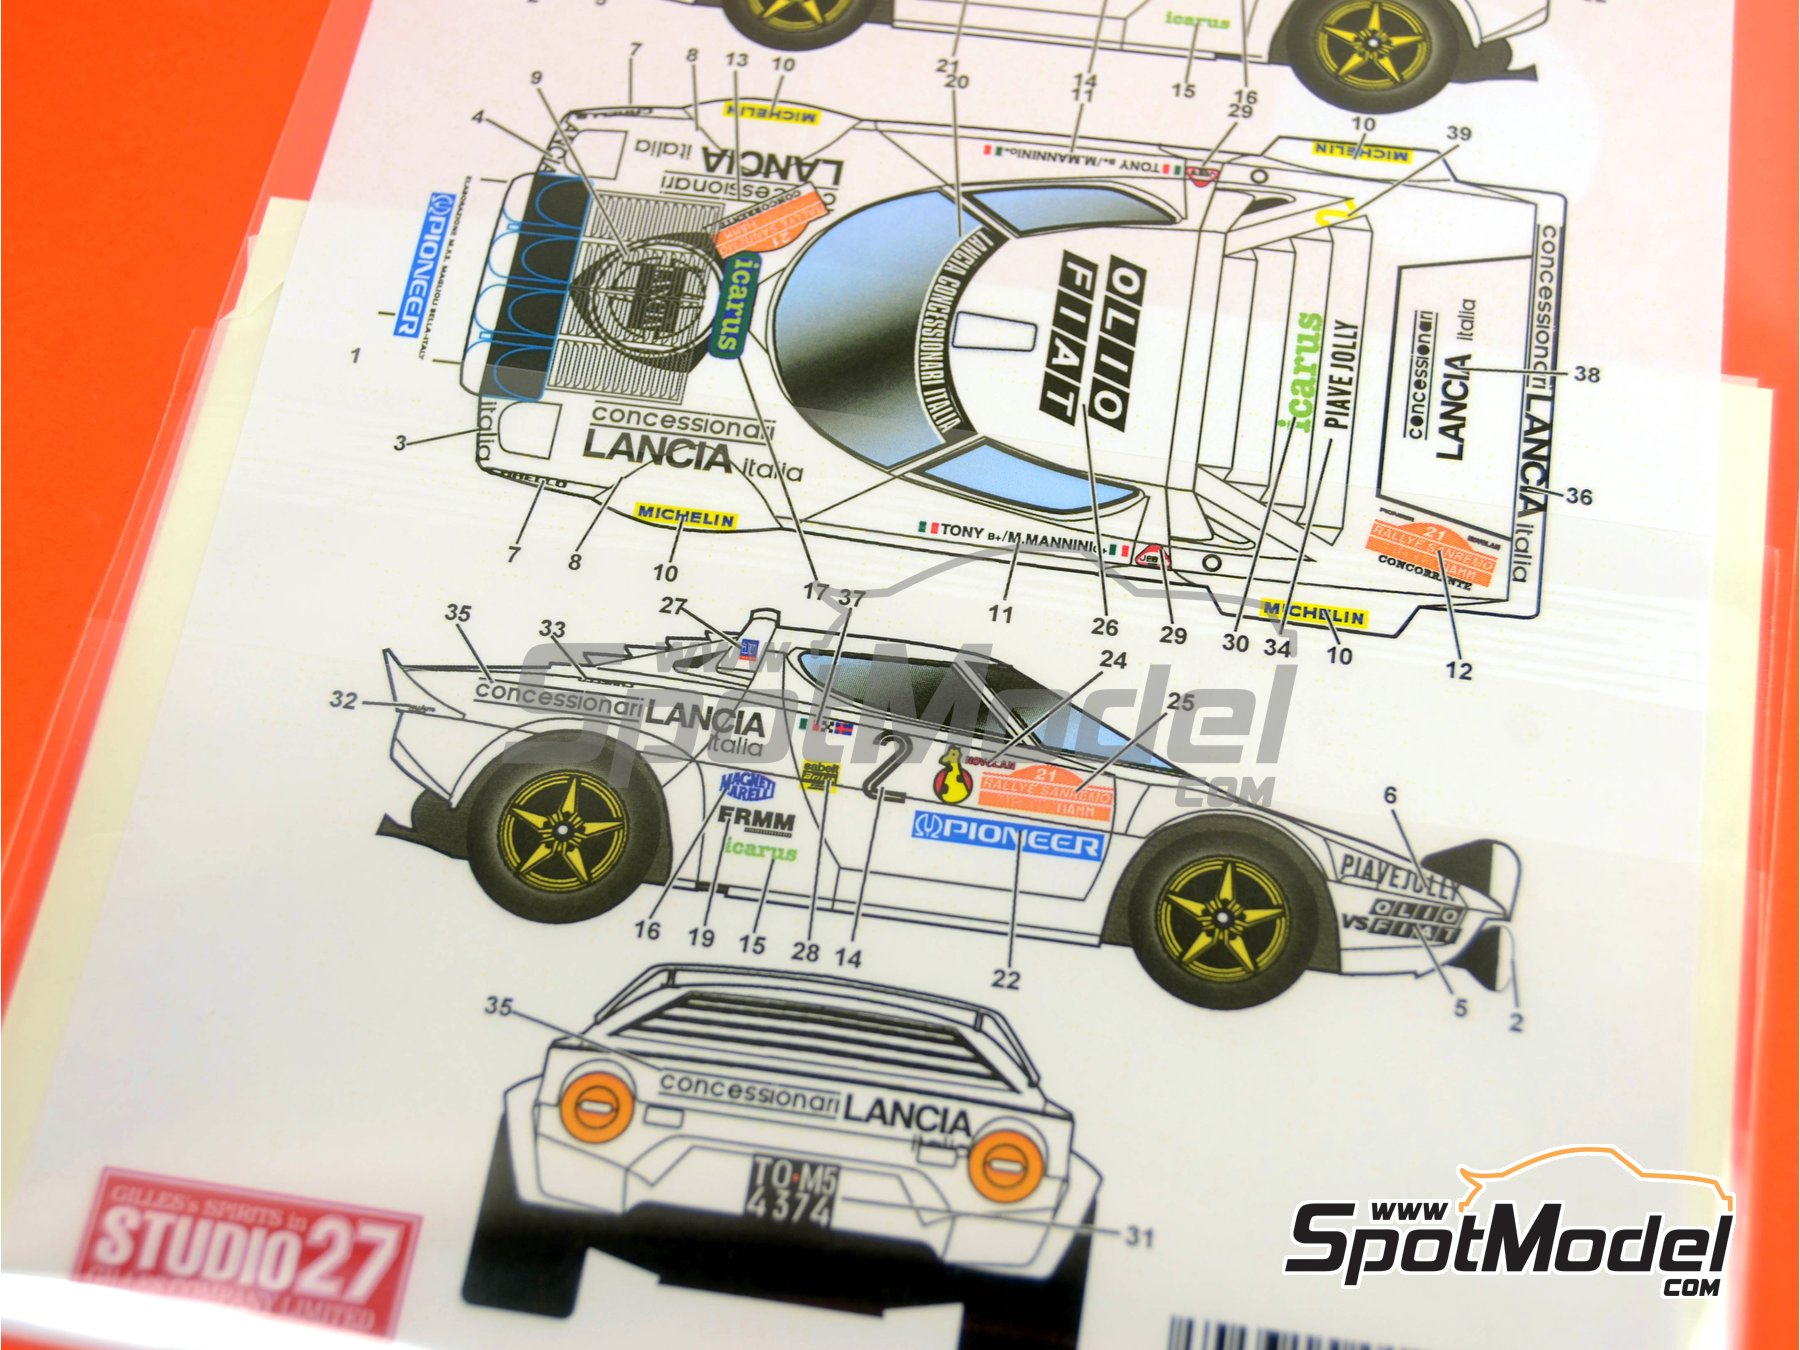 Image 2: Lancia Stratos HF Concessionari Lancia - Rally de San Remo 1979 | Calcas de agua en escala1/24 fabricado por Studio27 (ref.ST27-DC564D)